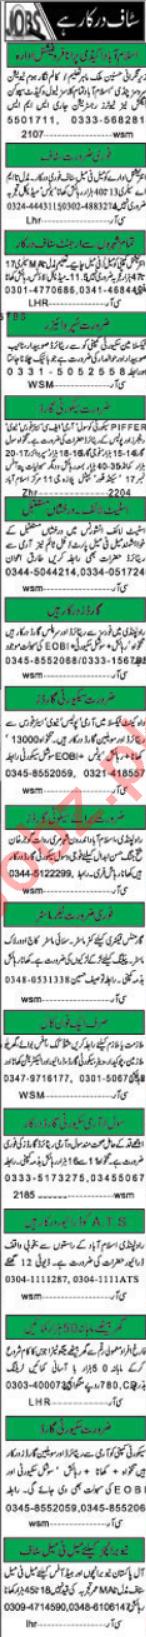 Daily Khabrain Newspaper Classified Jobs 2018